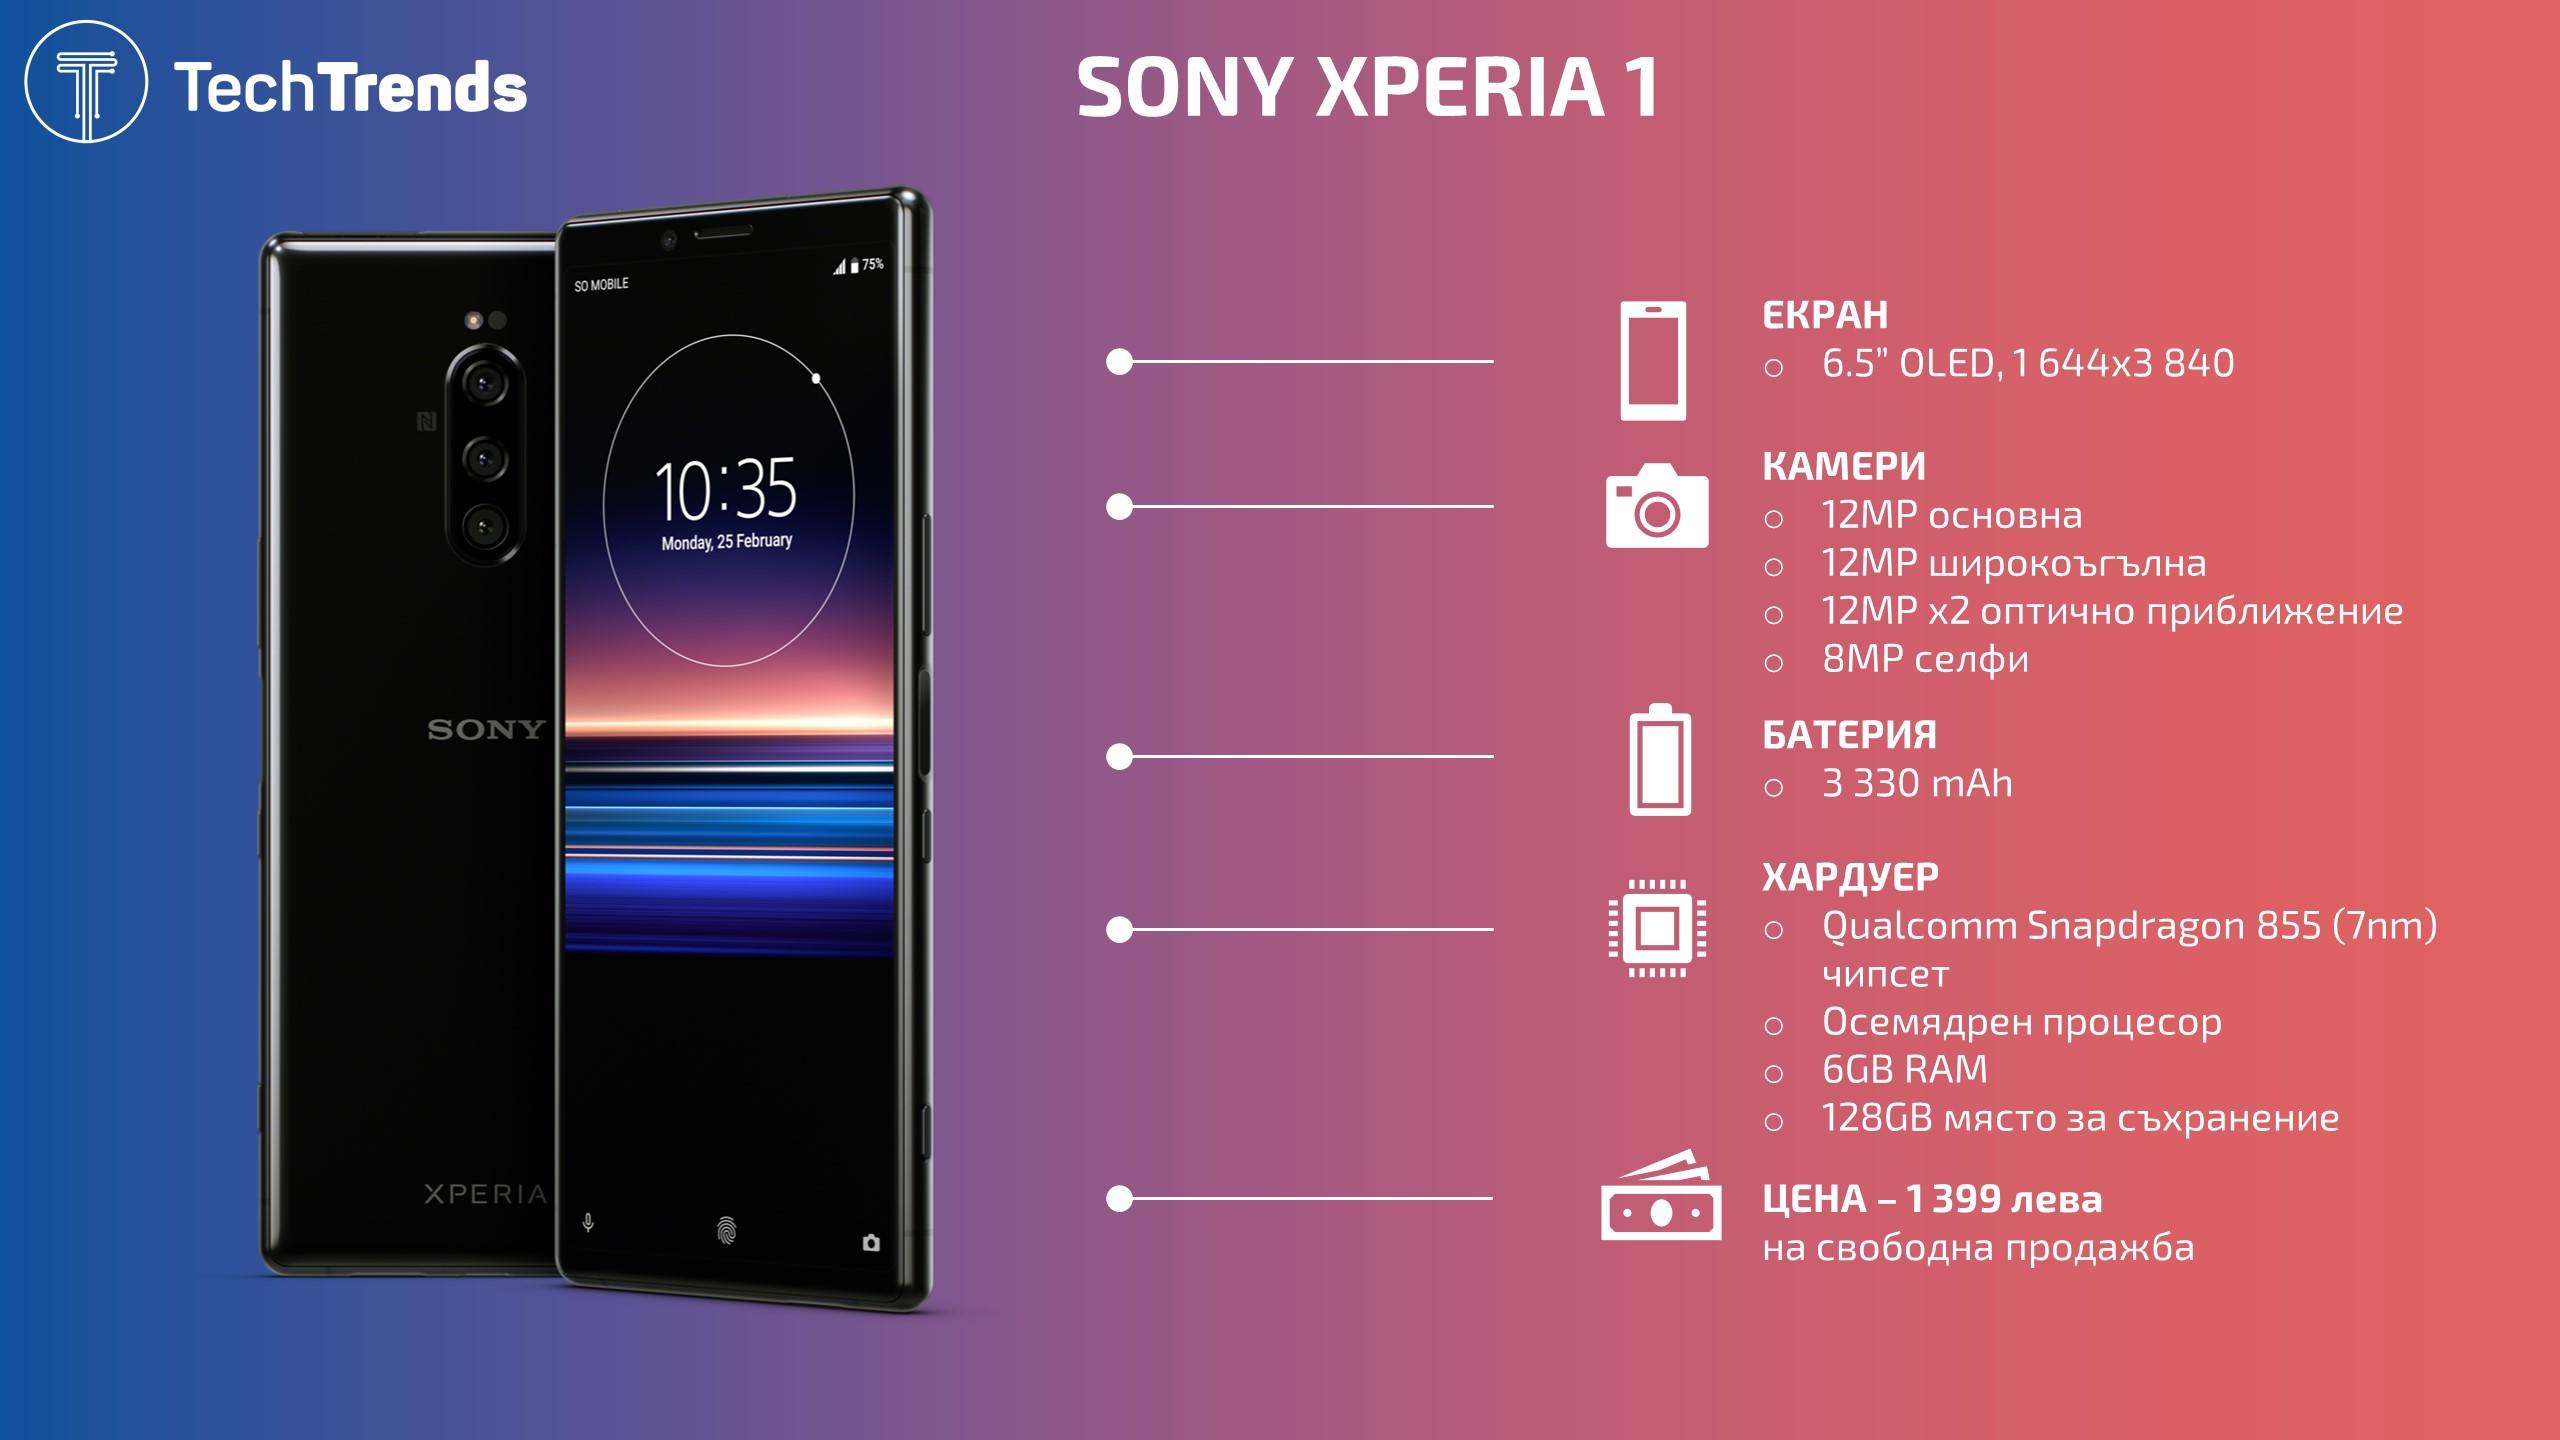 Sony-Xperia-1-Infographic